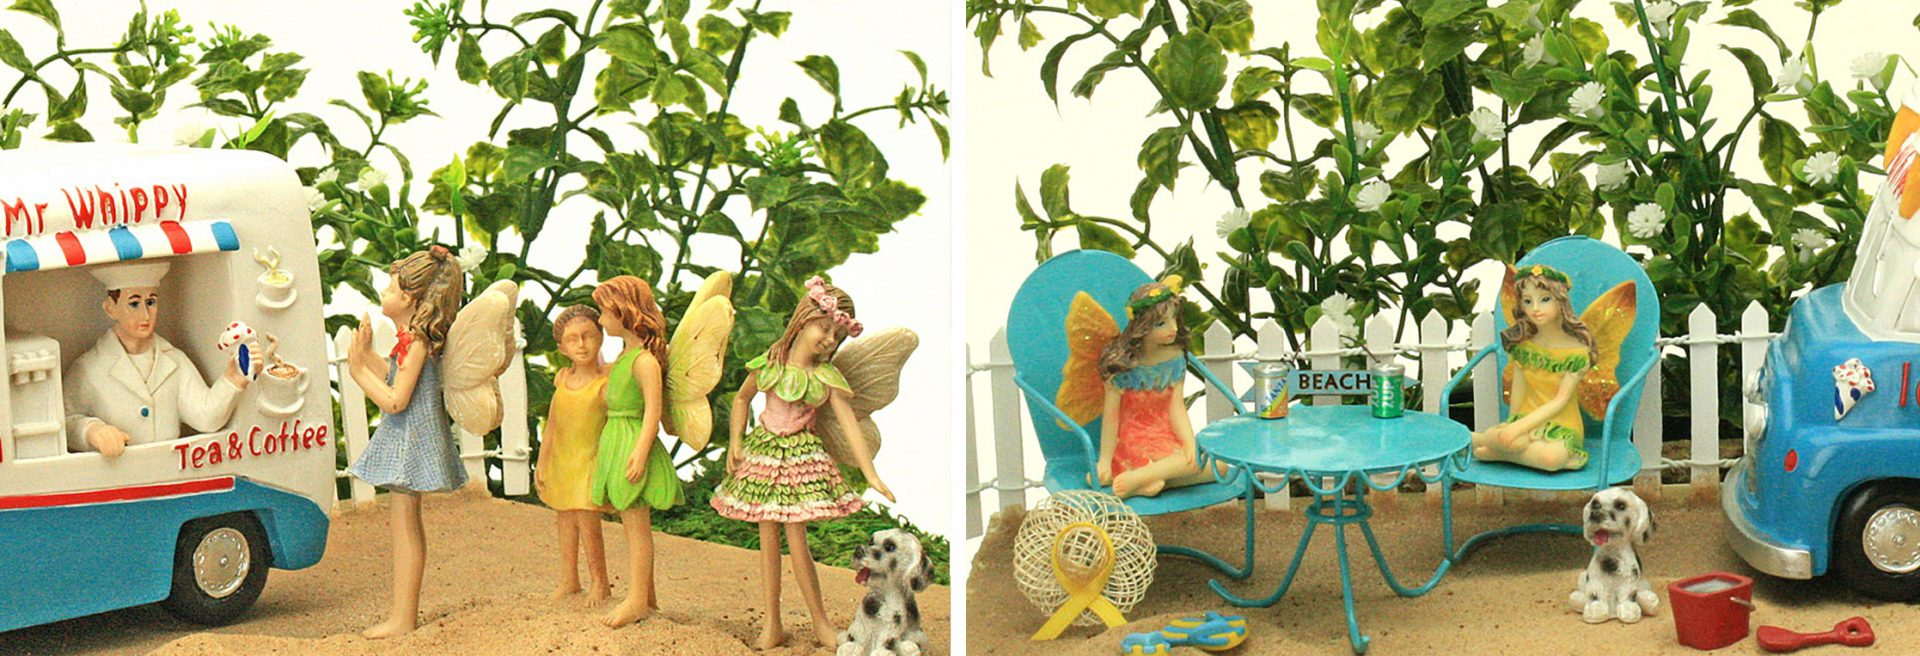 Fairy Garden Pictures Fairy Gardens Handmade Miniatures Fairy Gardens By Jennifer